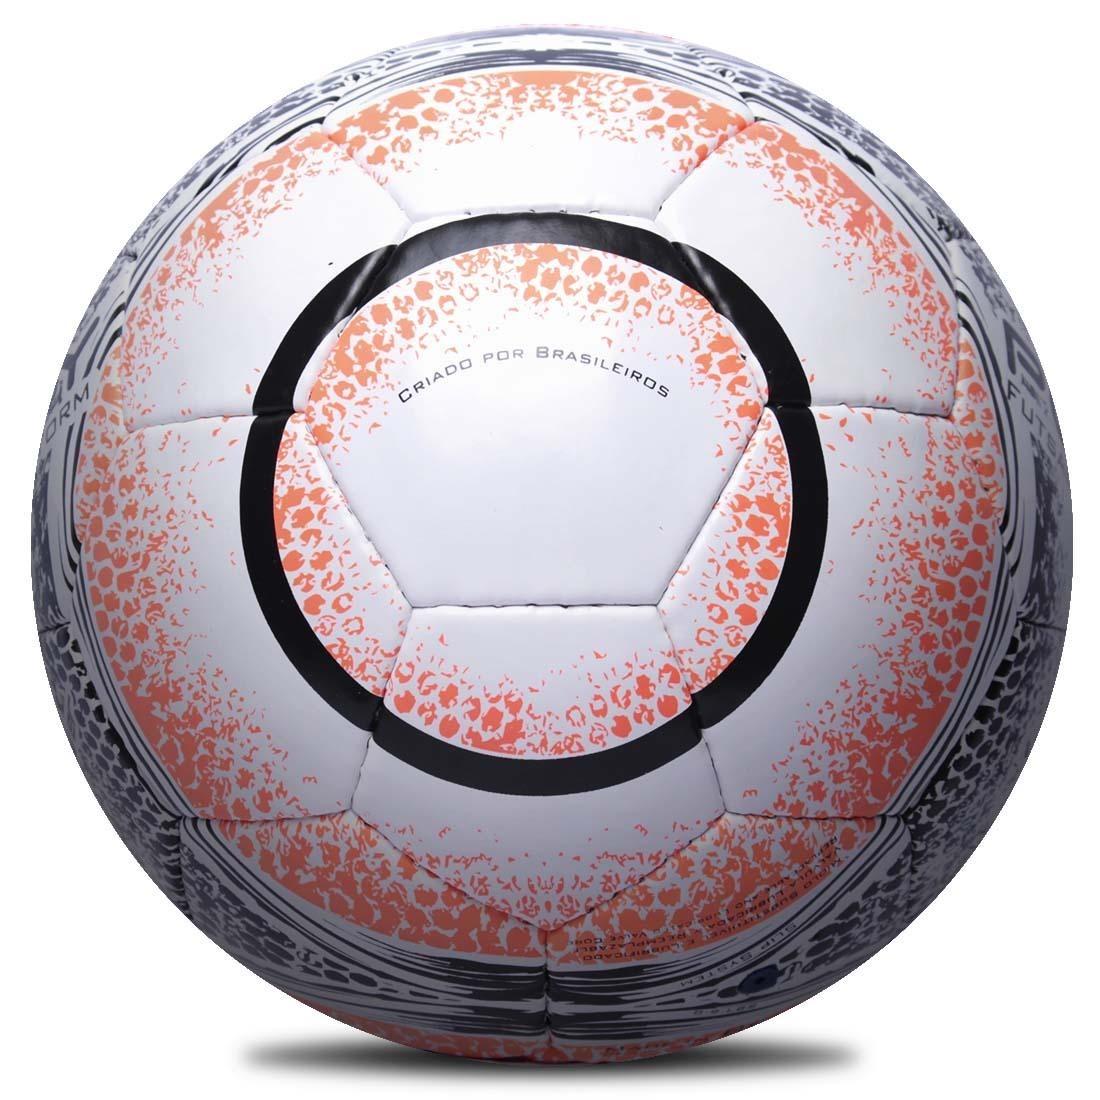 938906bd6b Carregando zoom... bola futsal penalty storm 500 costurada viii